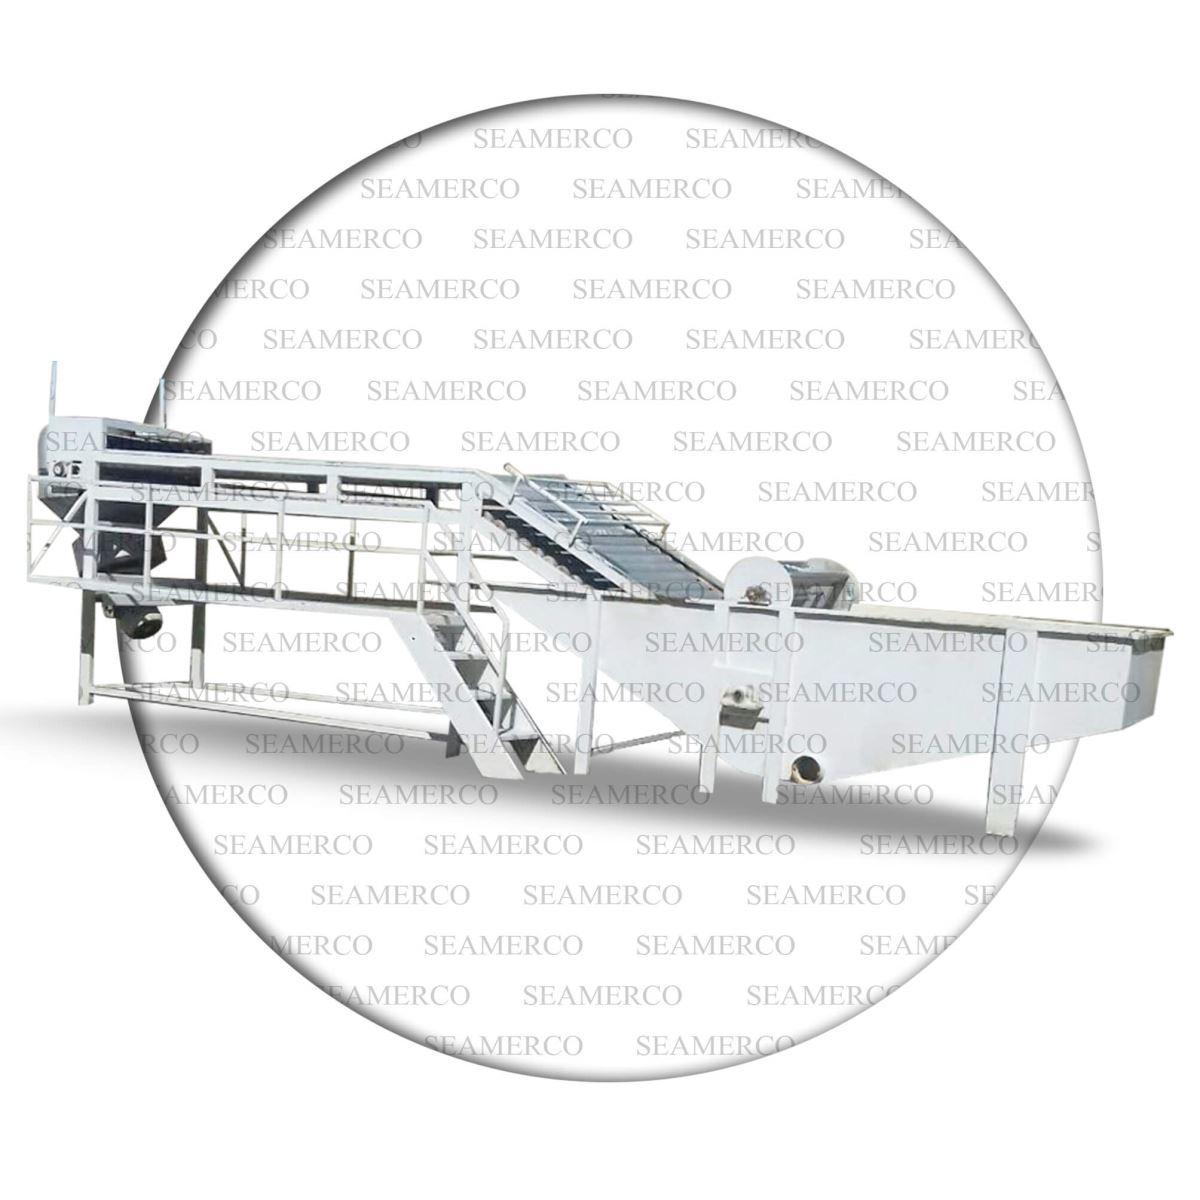 کانال شستشو-نوار سورتینگ-تجهیزات کارخانه رب گوجه فرنگی-کانال شستشوی گوجه فرنگی-